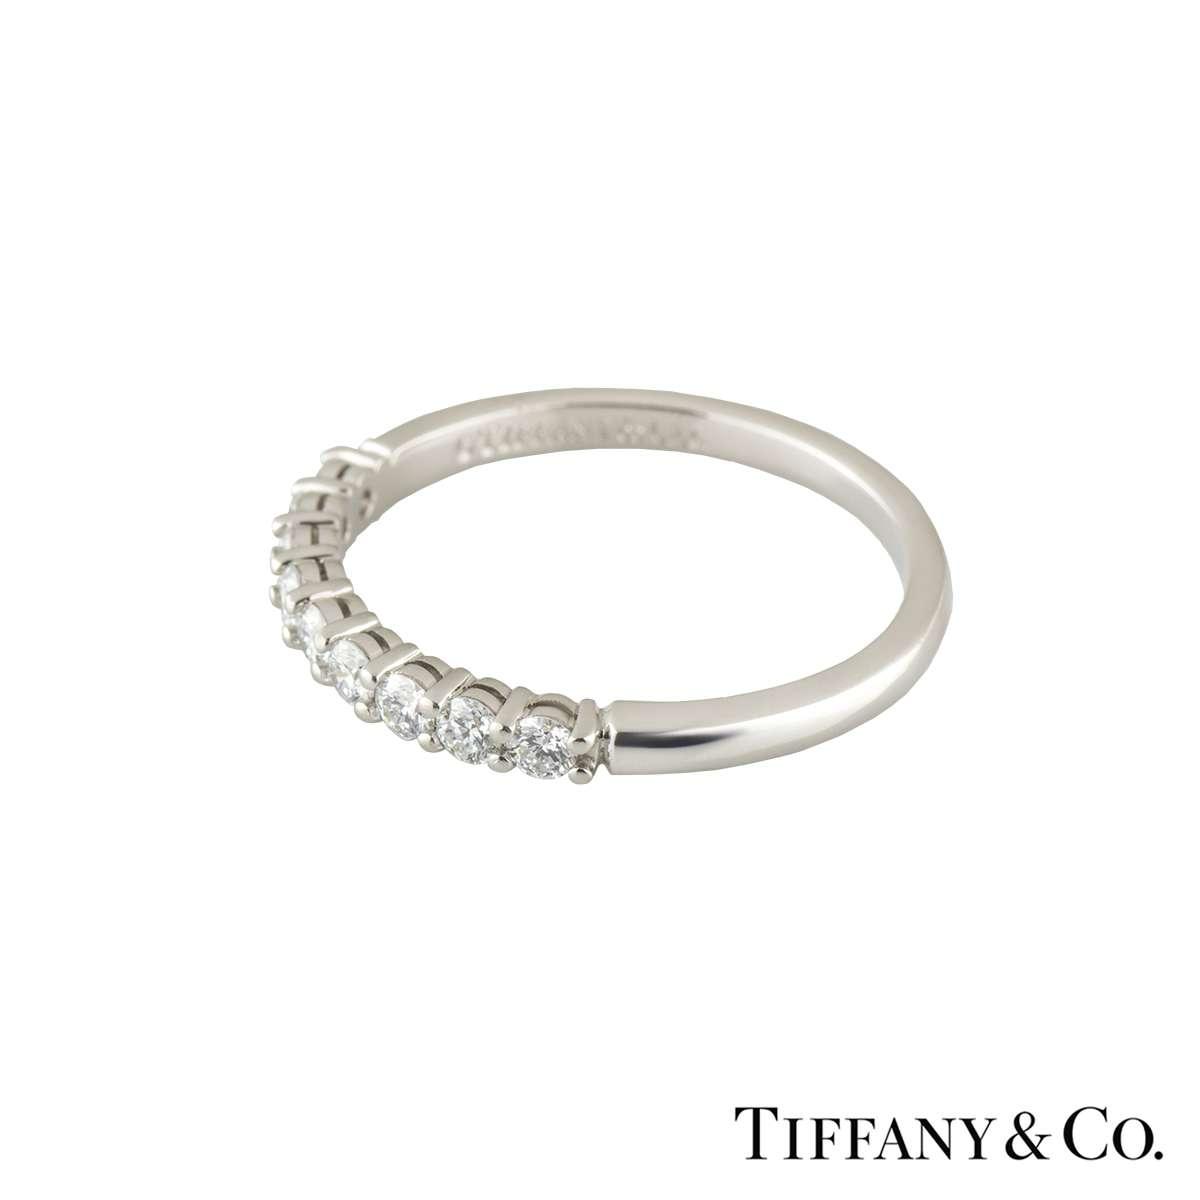 Tiffany Co Platinum Lucida 2mm Wedding Band Ring Sz 8: Tiffany Embrace Ring